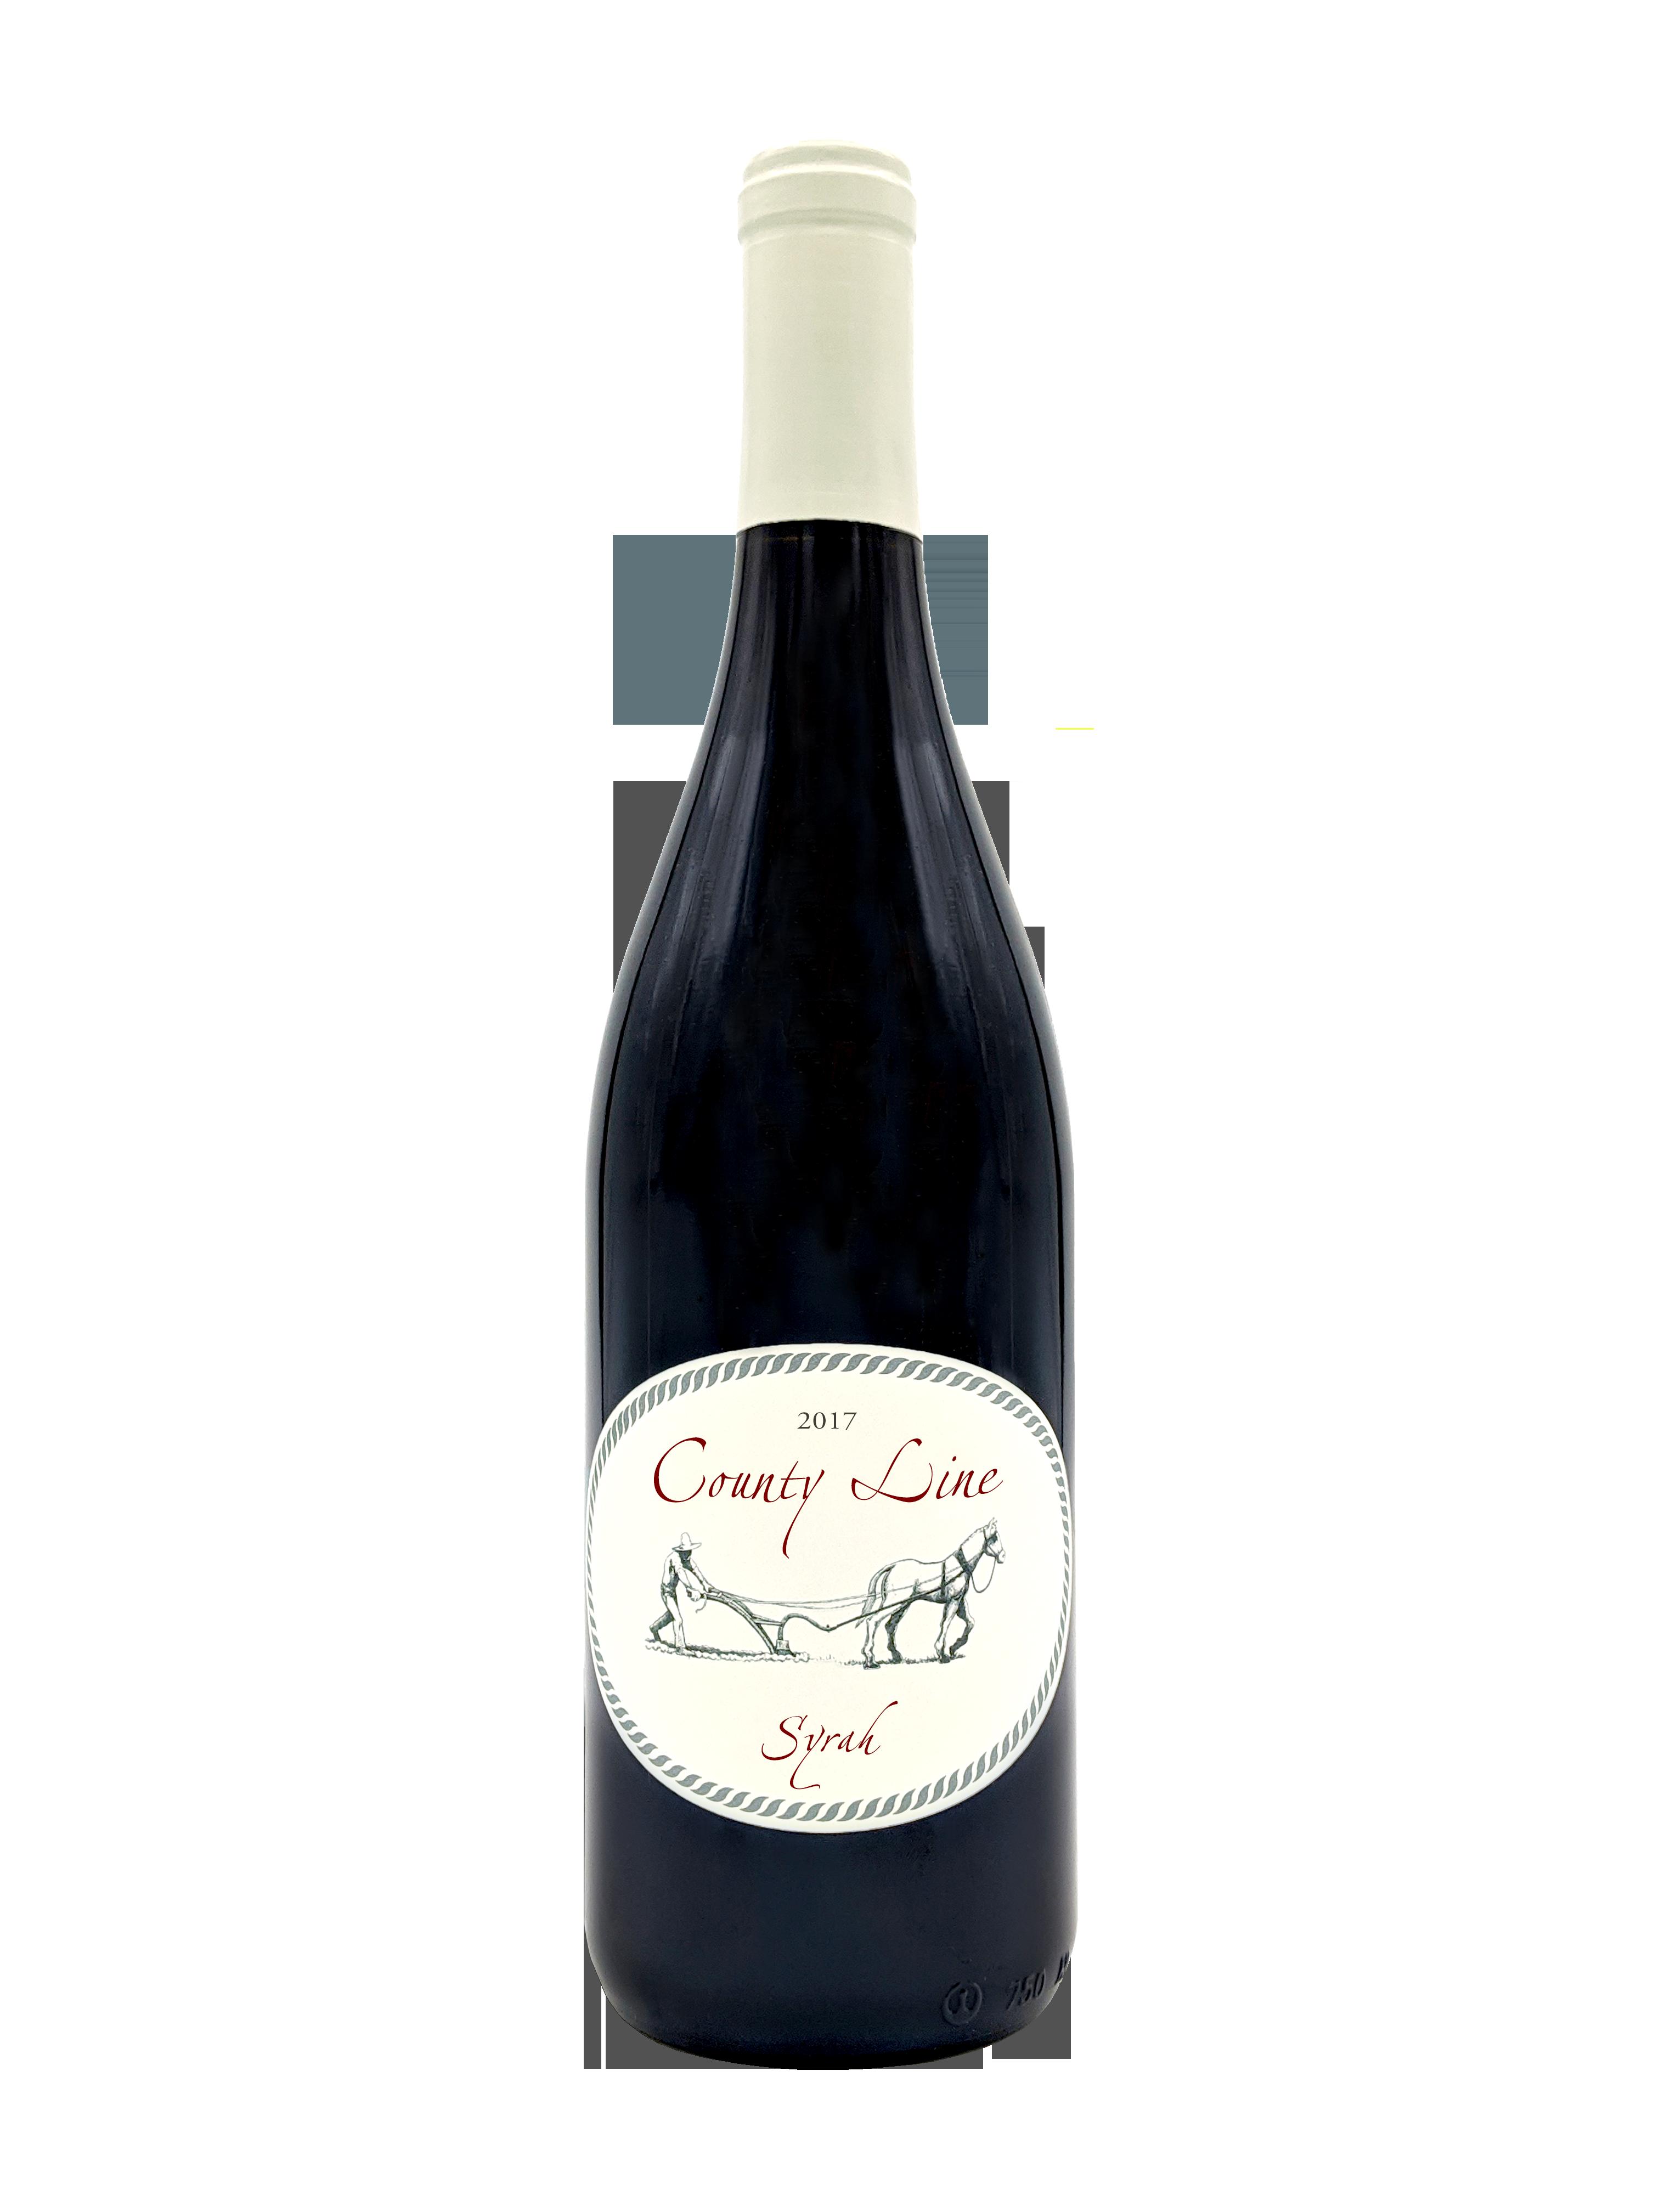 county line 2017 syrah bottle